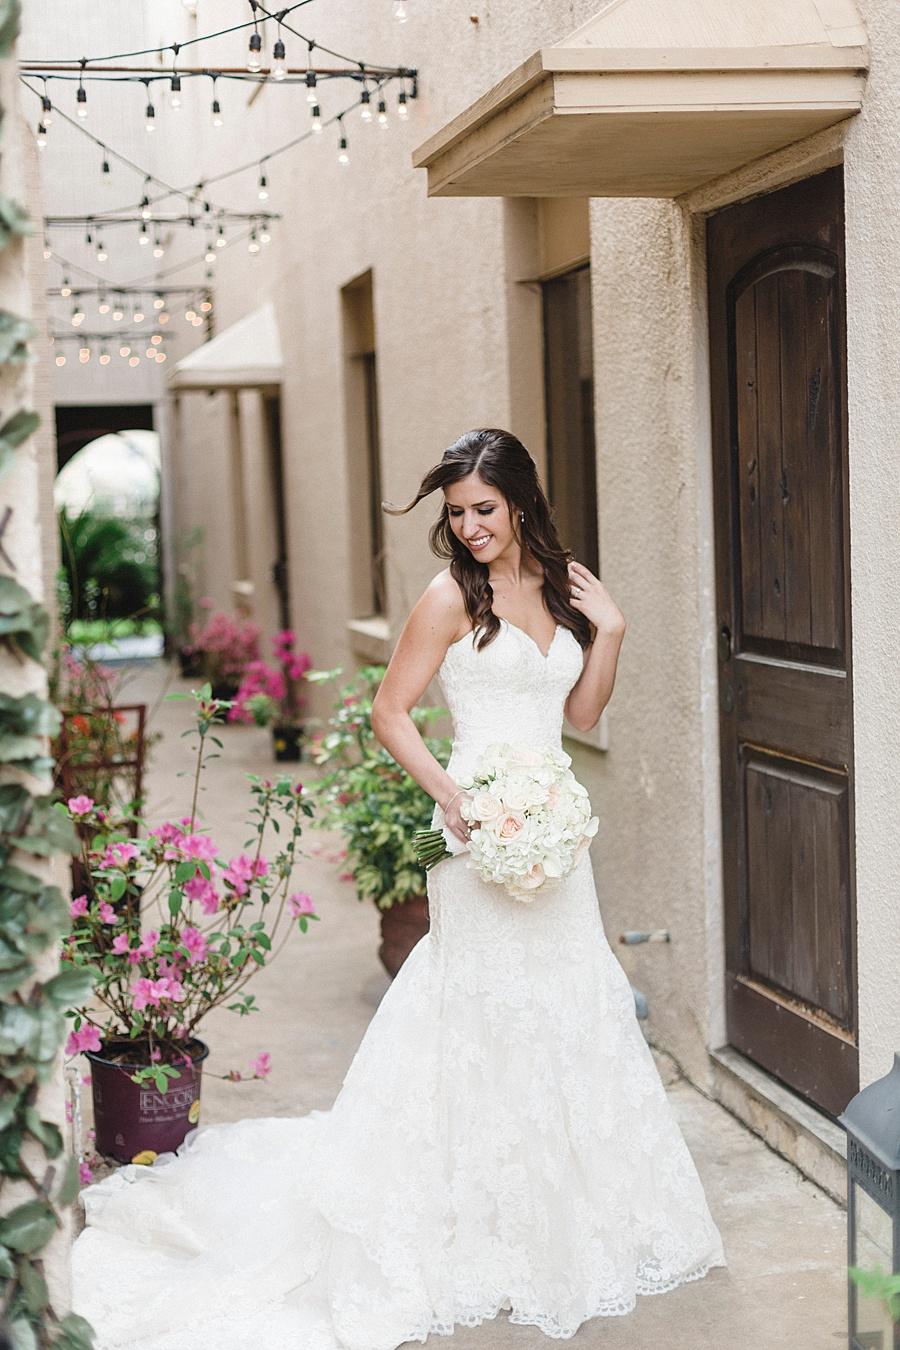 Stacy Anderson Photography Heights Villa wedding photographer_0005.jpg